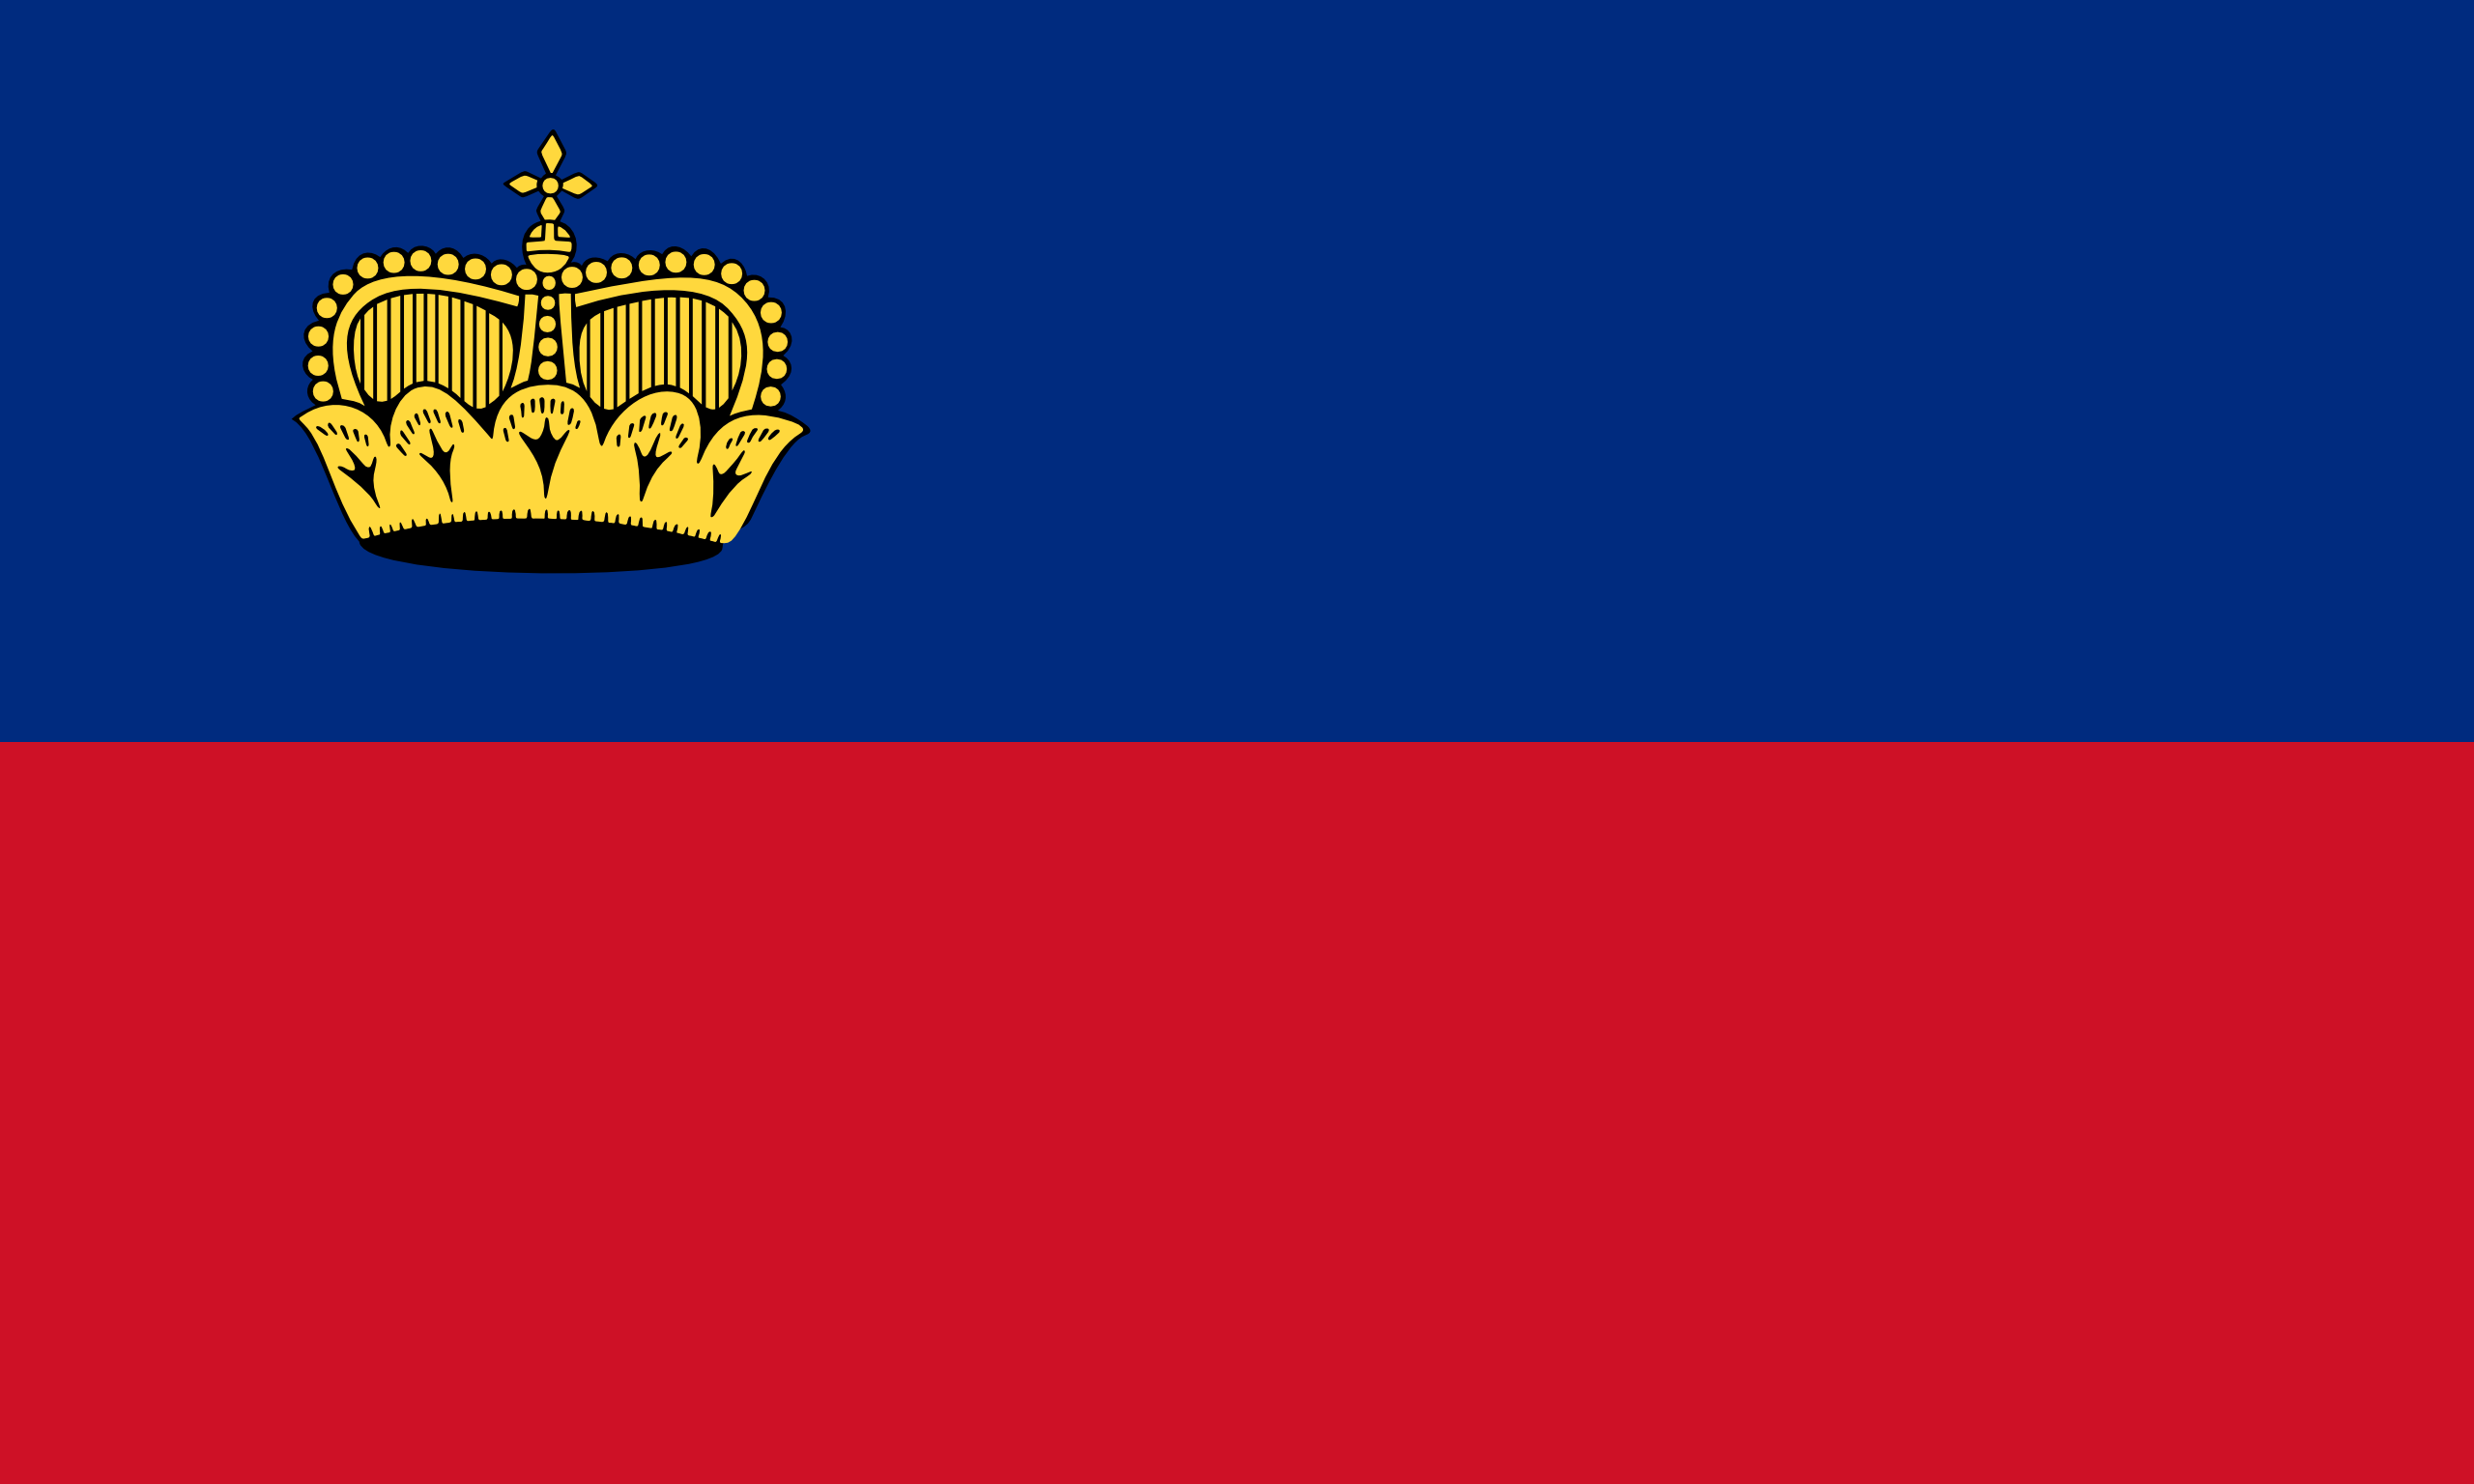 Liechtenstein, país, Brasão de armas, logotipo, símbolo - Papéis de parede HD - Professor-falken.com